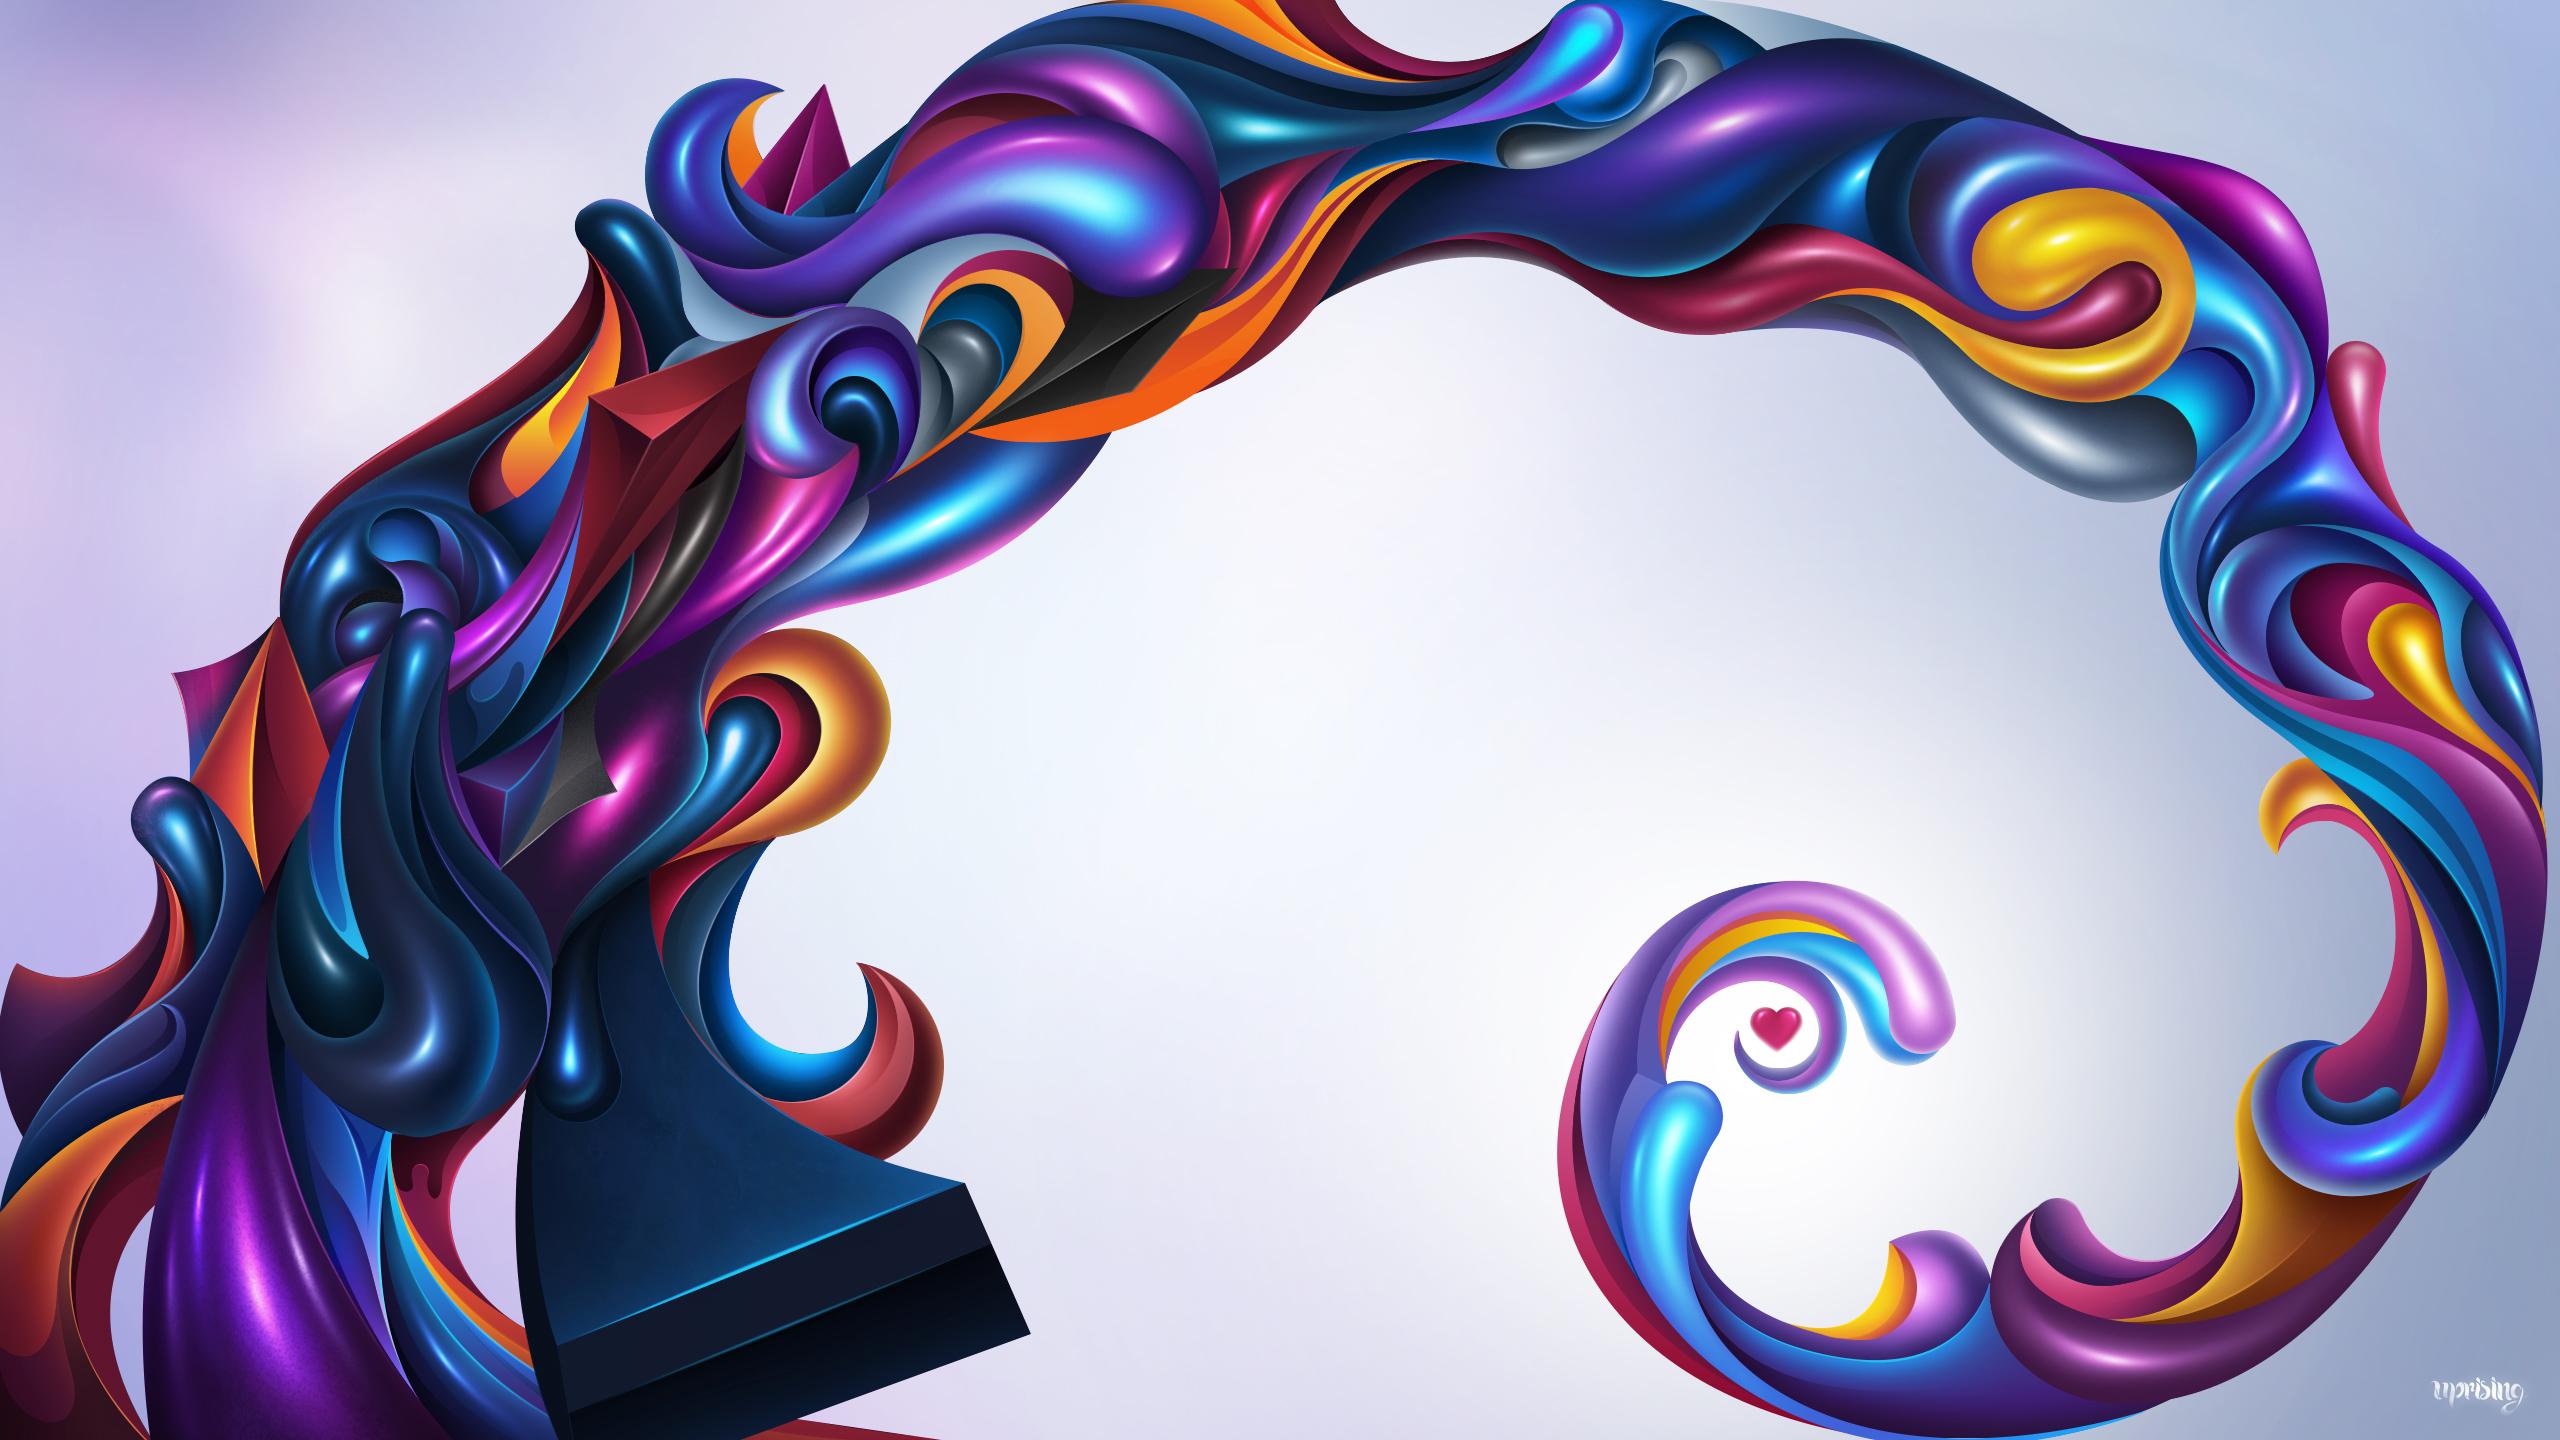 Golden ratio Spiral Wallpaper Download - High Resolution 4K